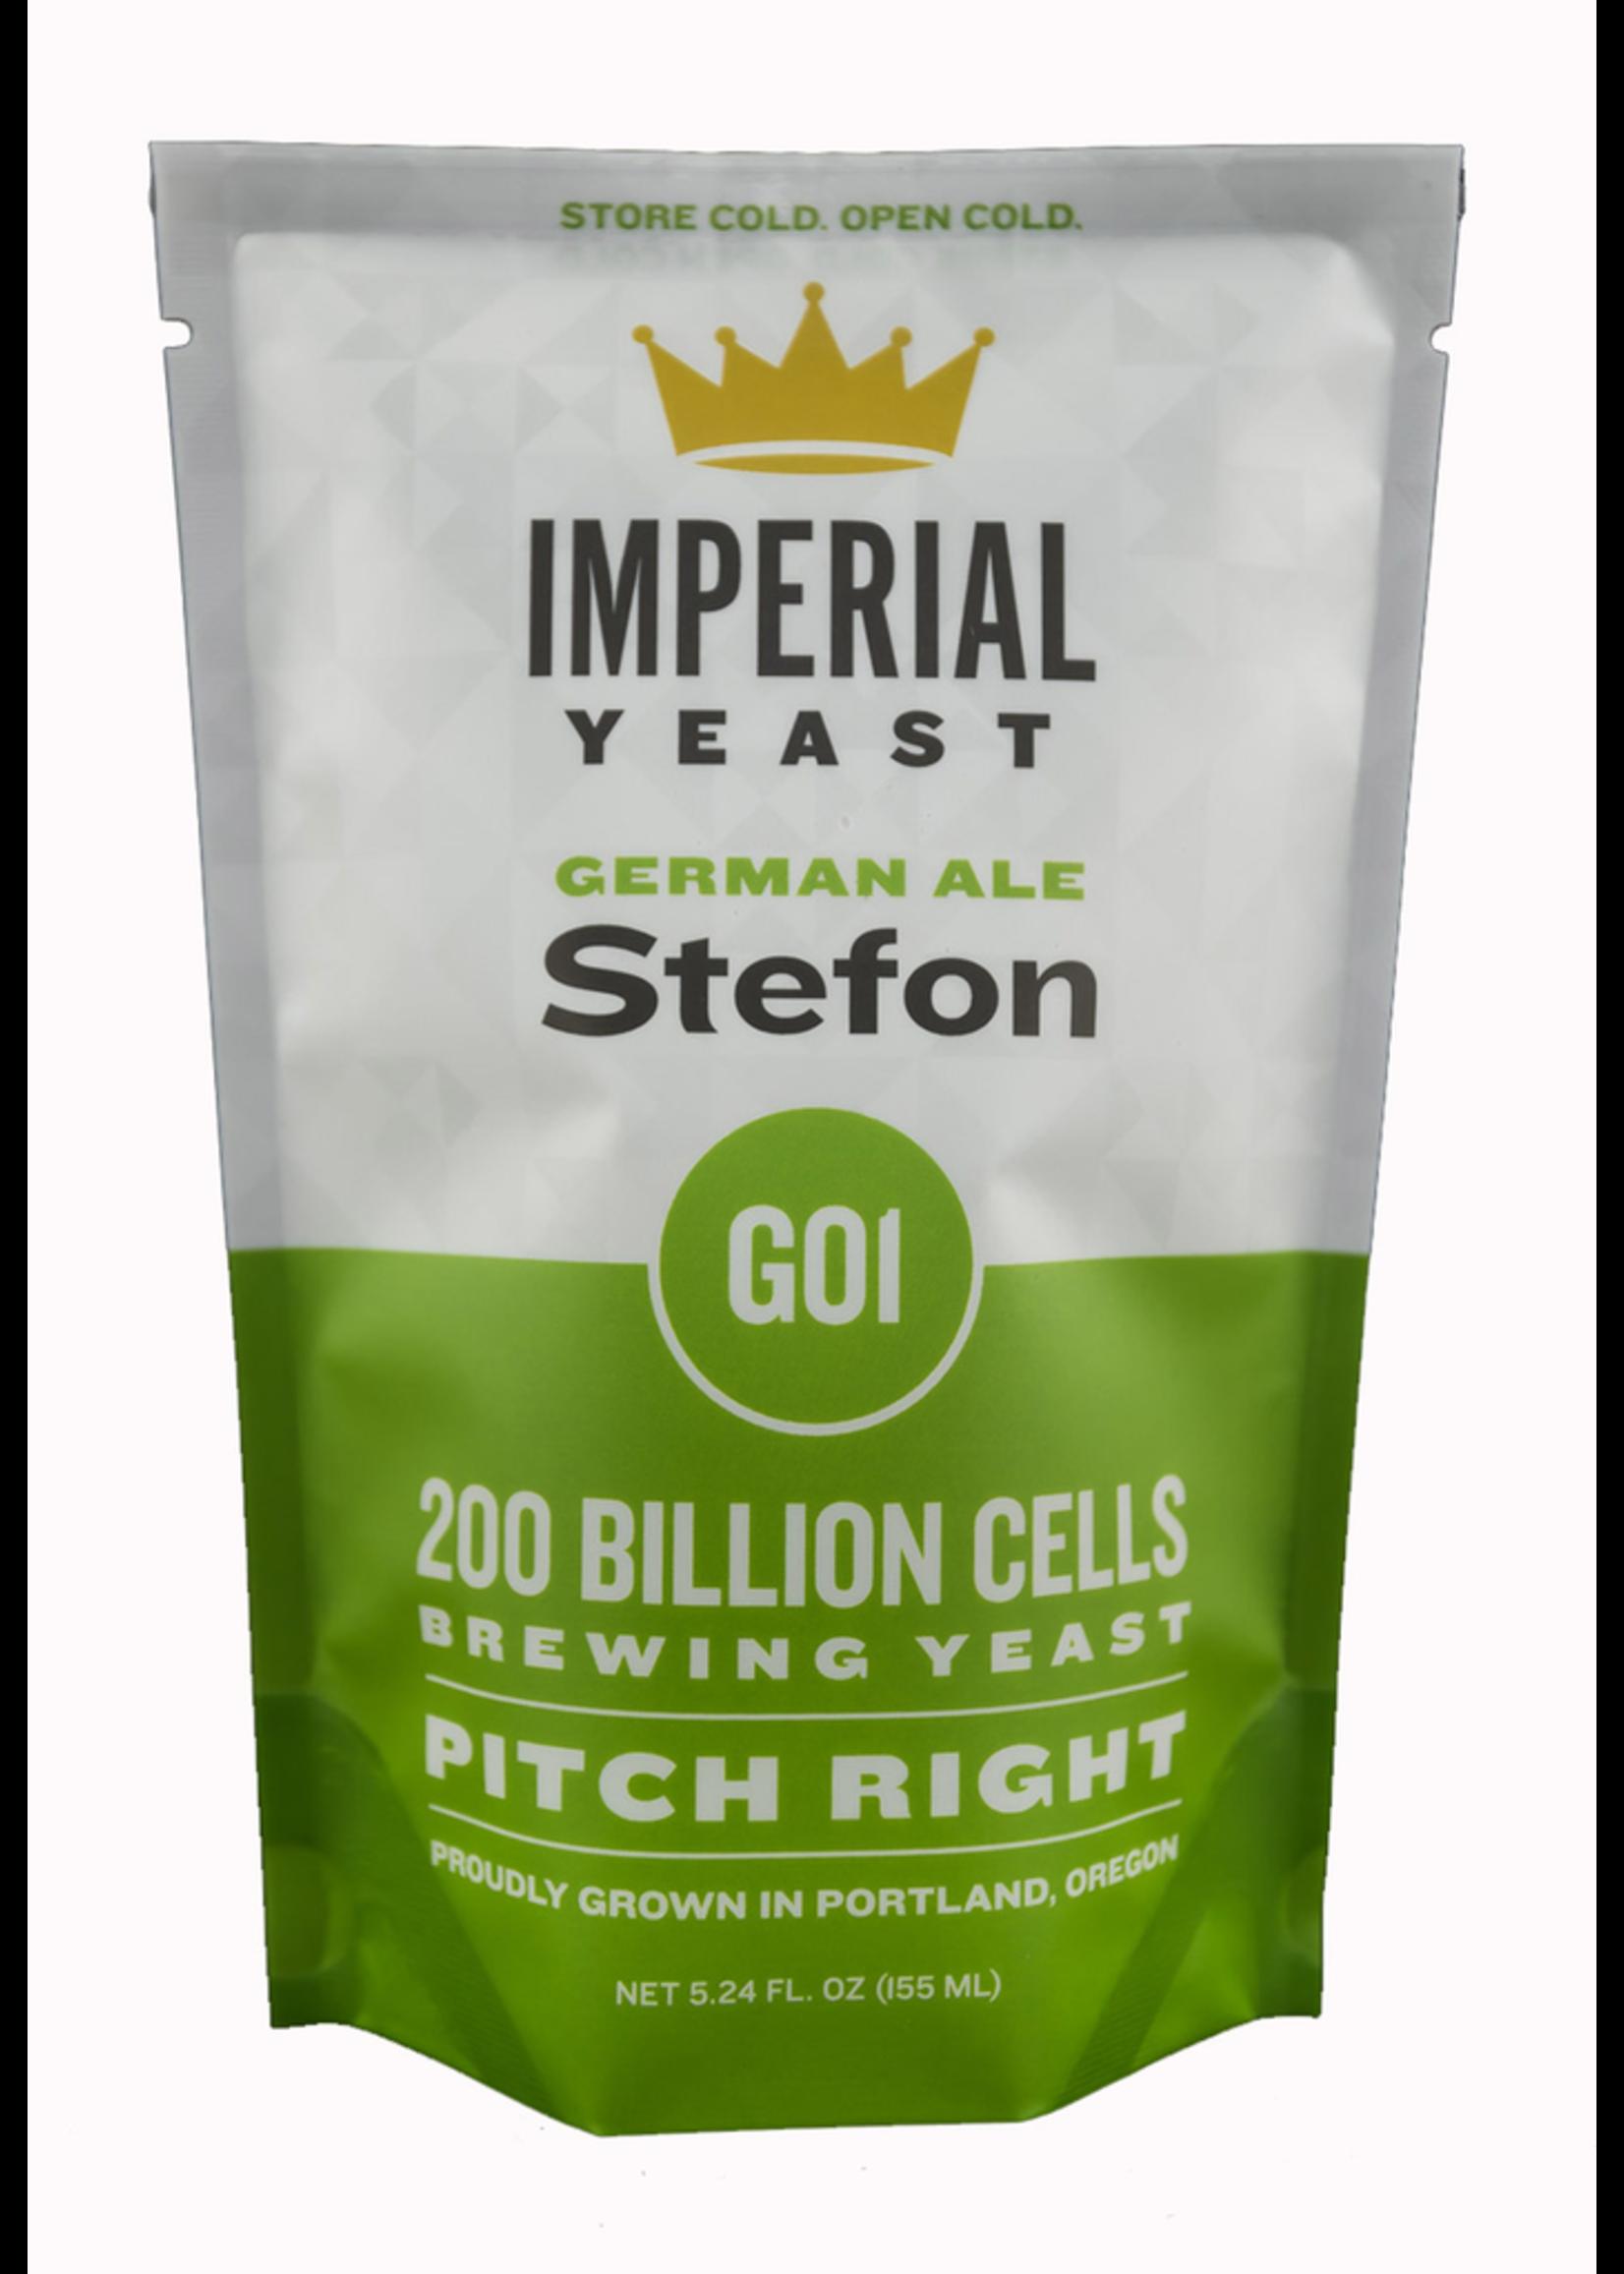 Yeast Imperial Organic Yeast G01 - Stefon